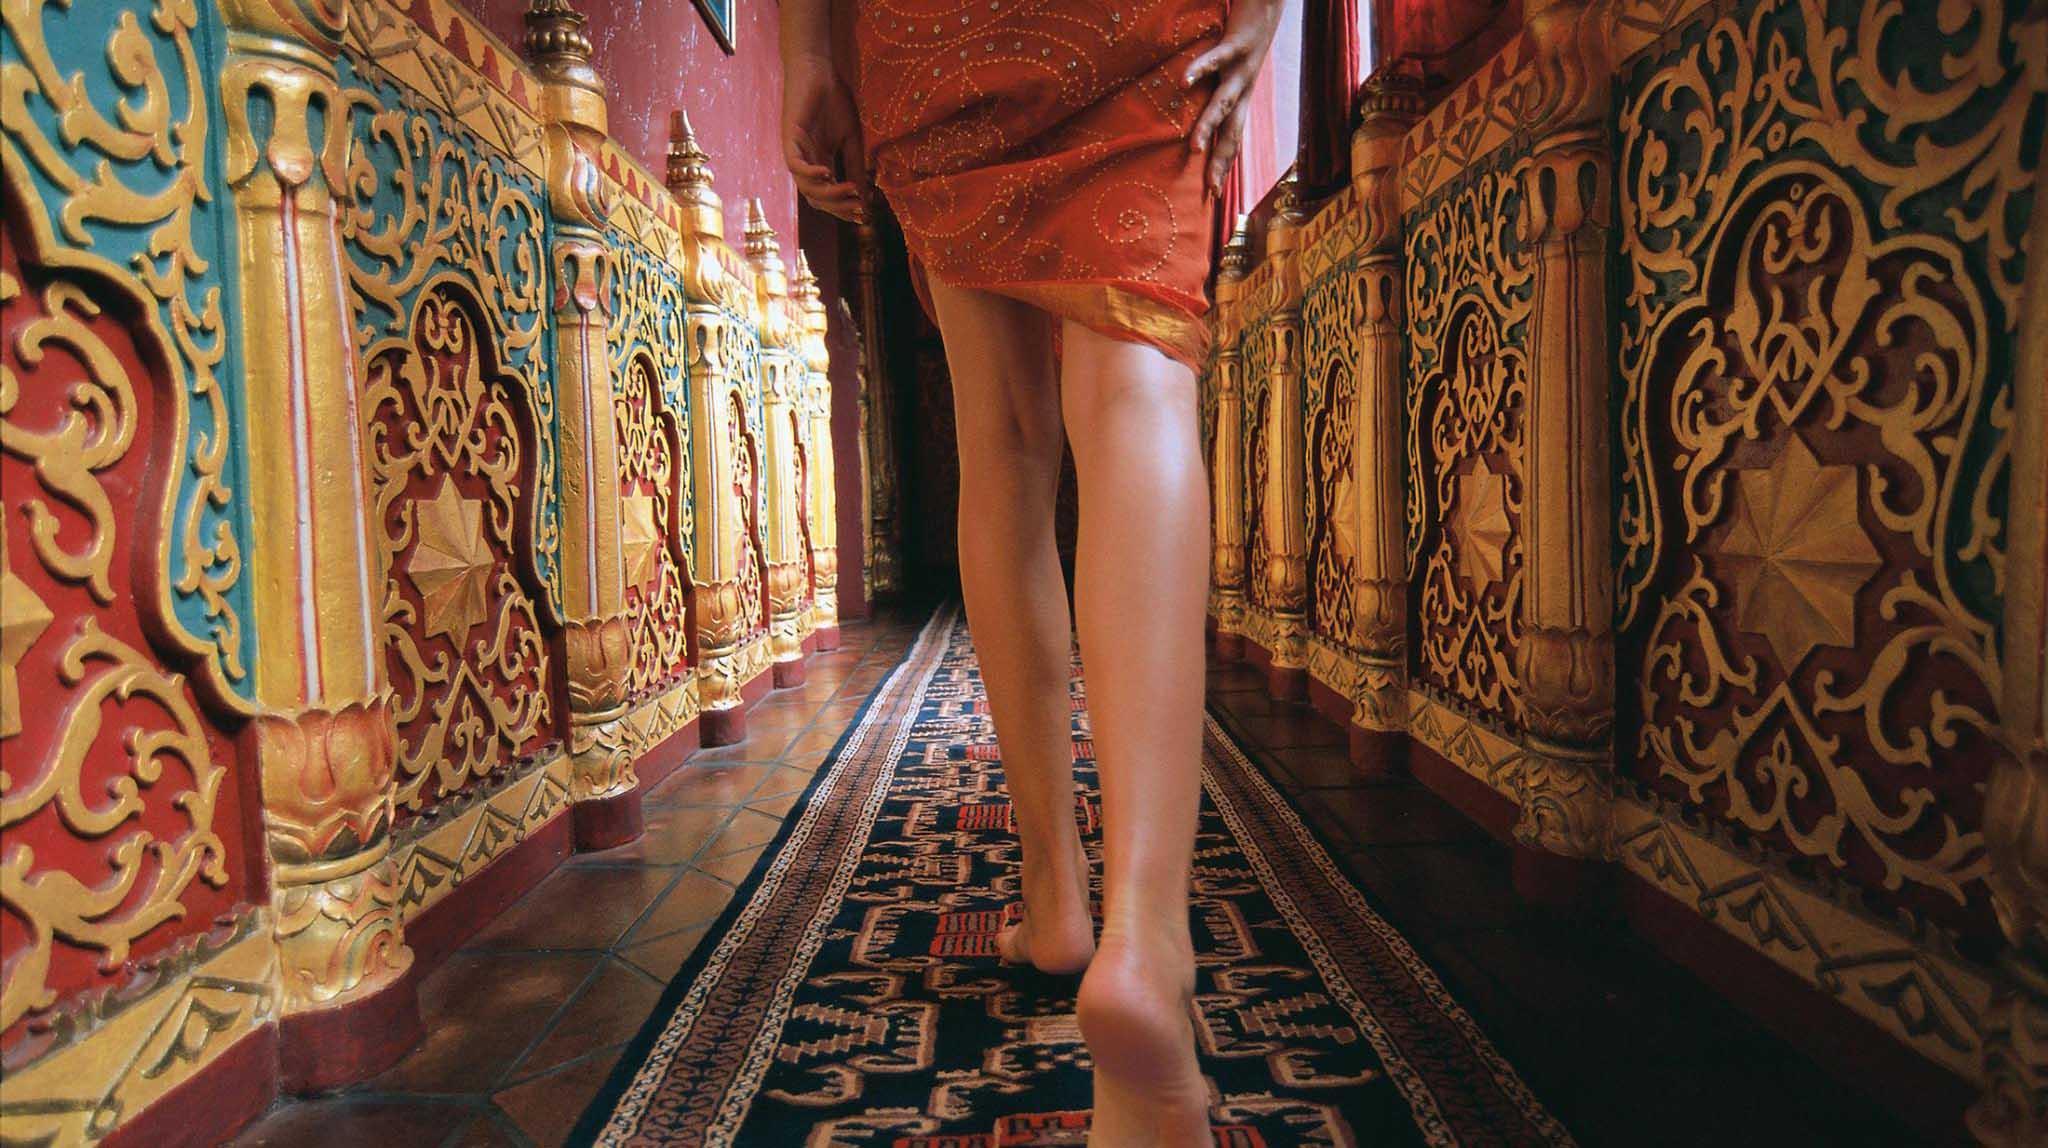 Prana Spa - Best Seminyak Spas in Bali